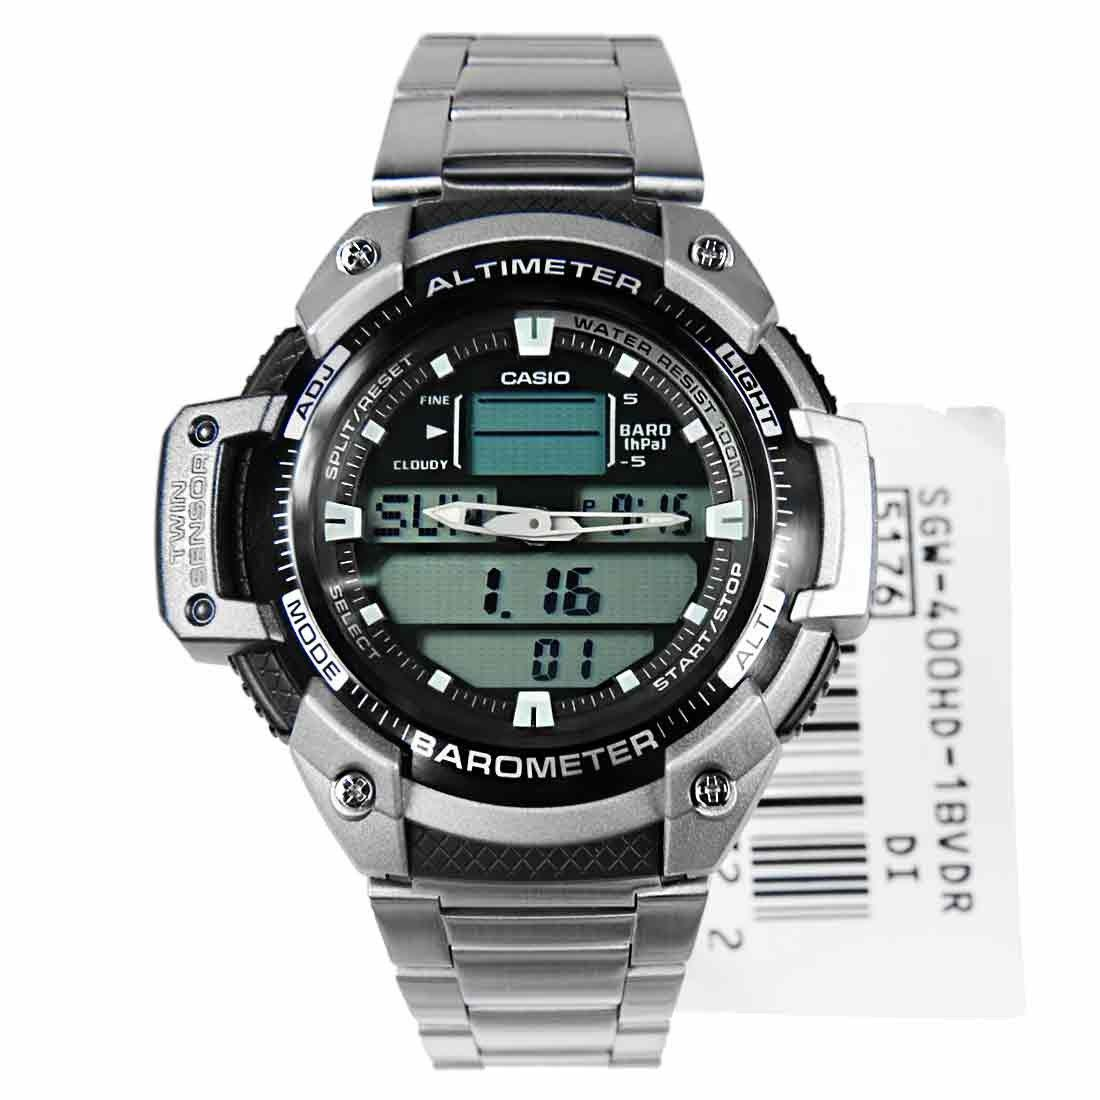 Relógio Casio OutGear SGW-400HD com Barômetro e Altímetro  - MGPesca